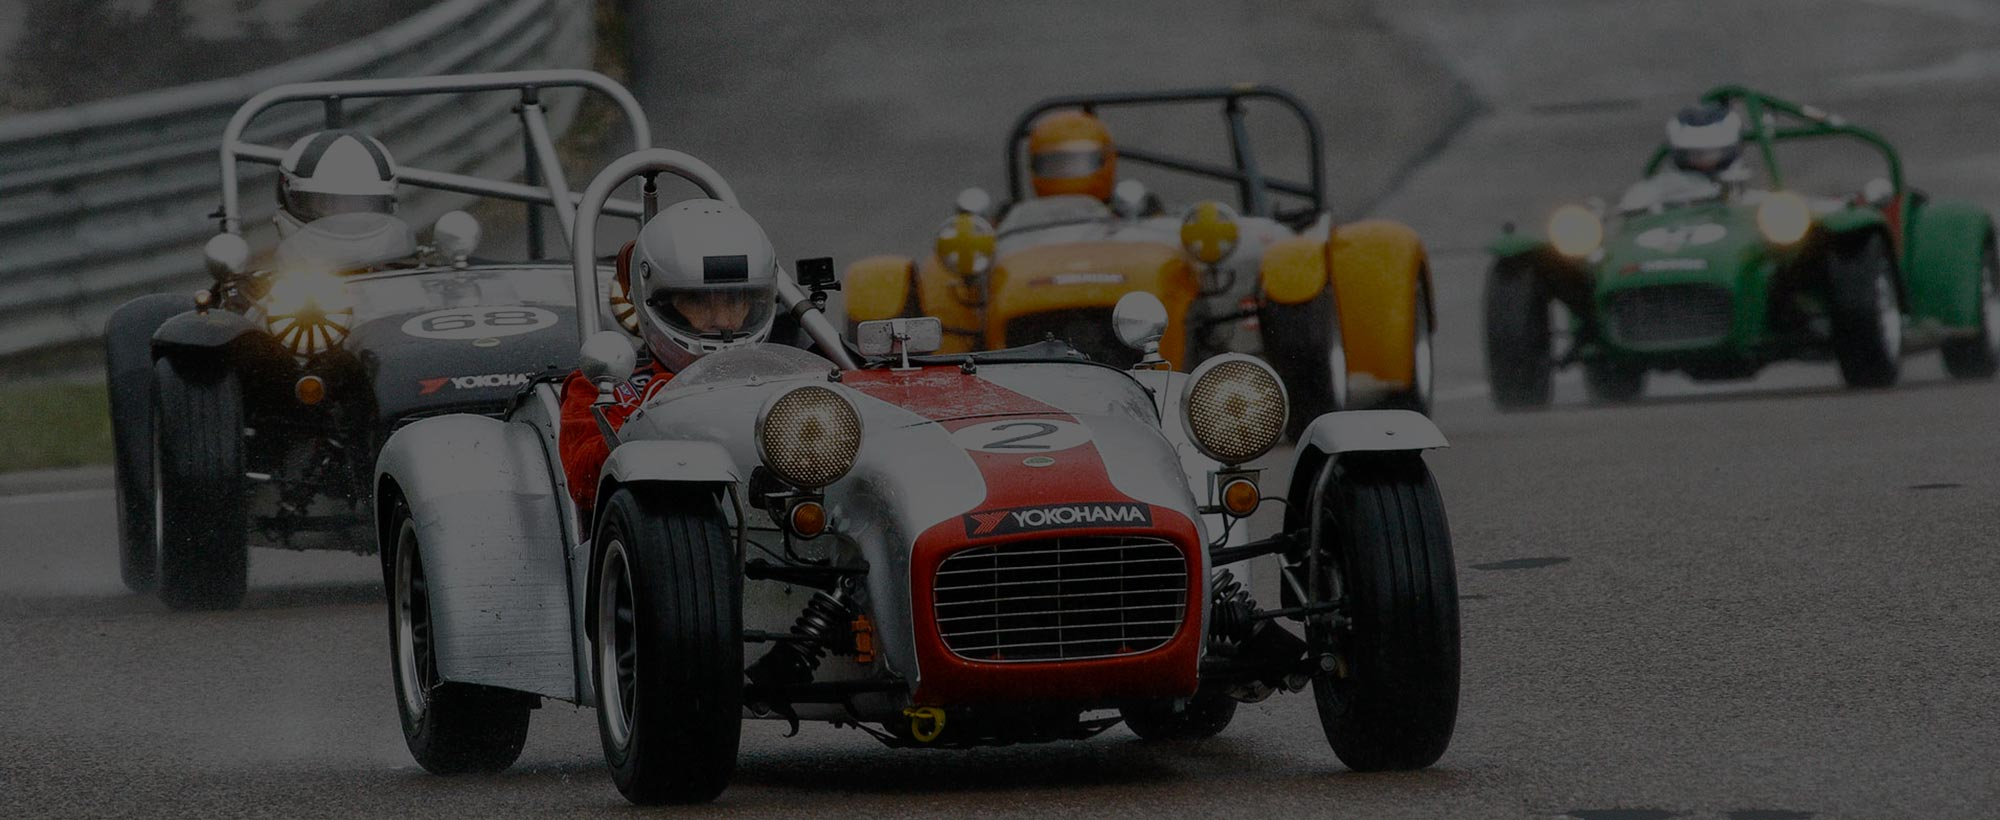 Circuit Val De Vienne Calendrier 2019.Calendrier Tarifs 2019 Trophee Lotus